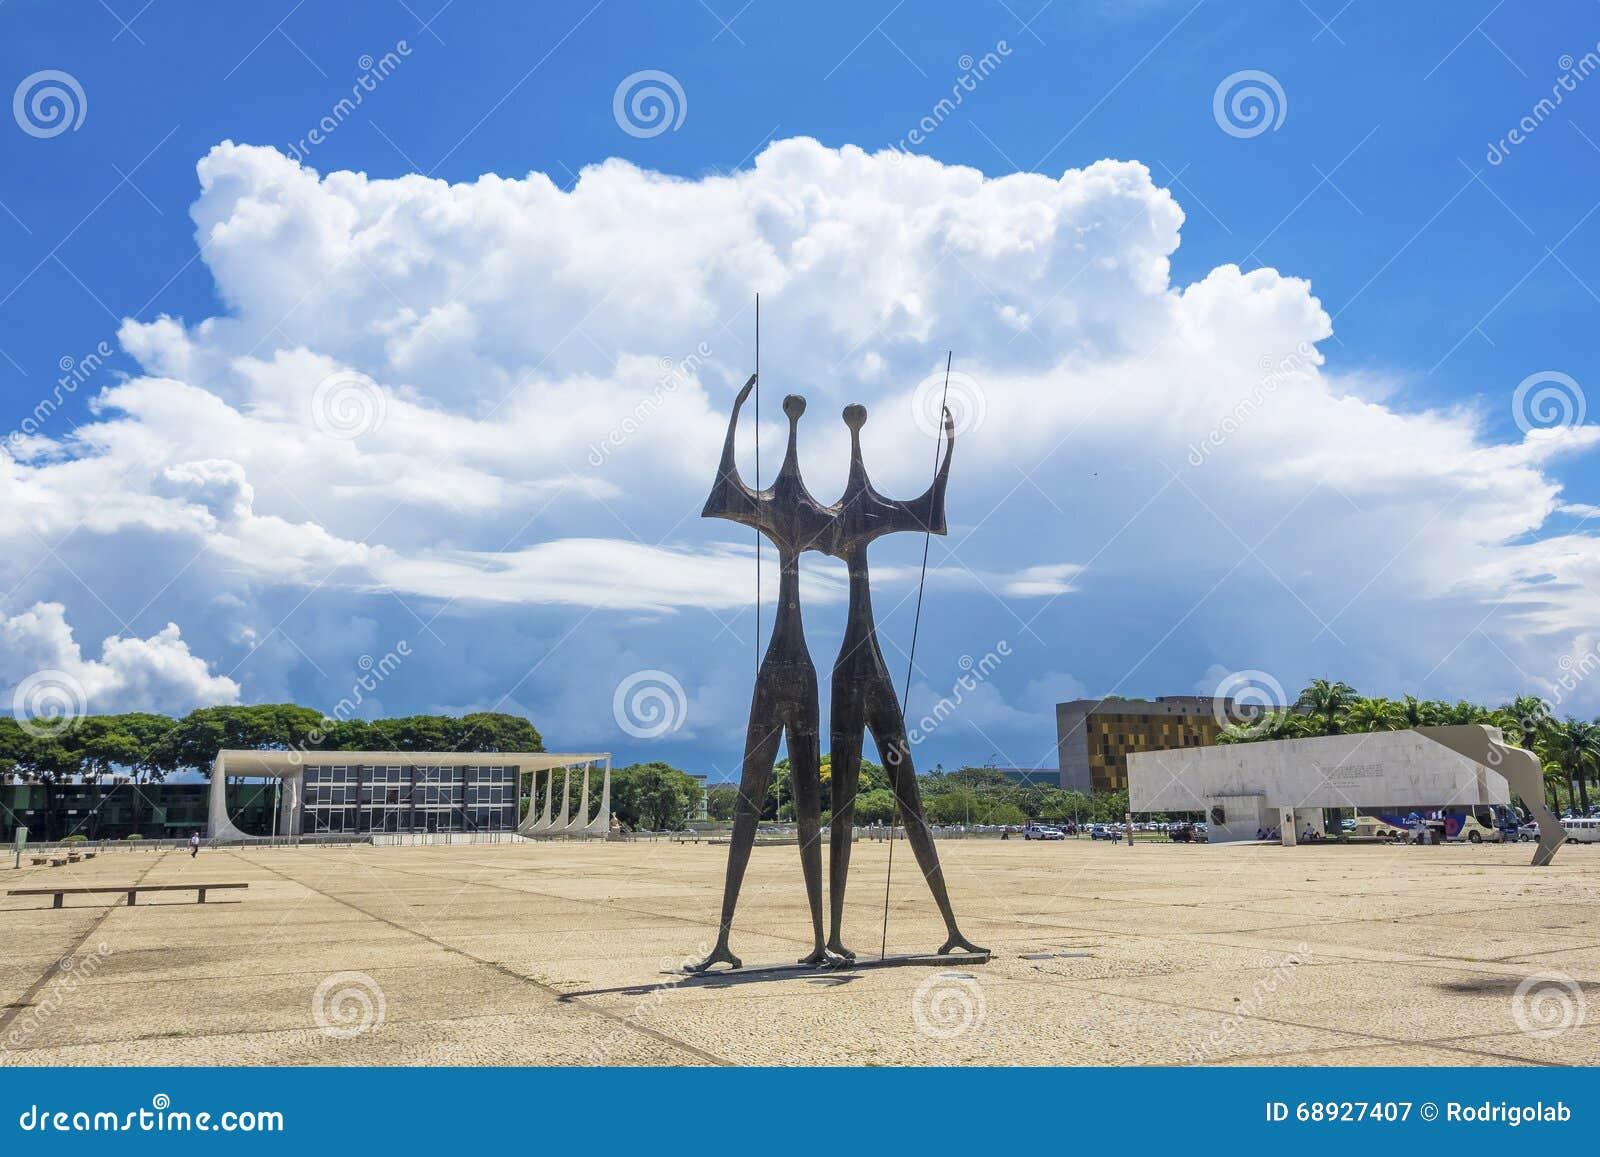 Het Monument van Doiscandangos in Brasilia, Brazilië